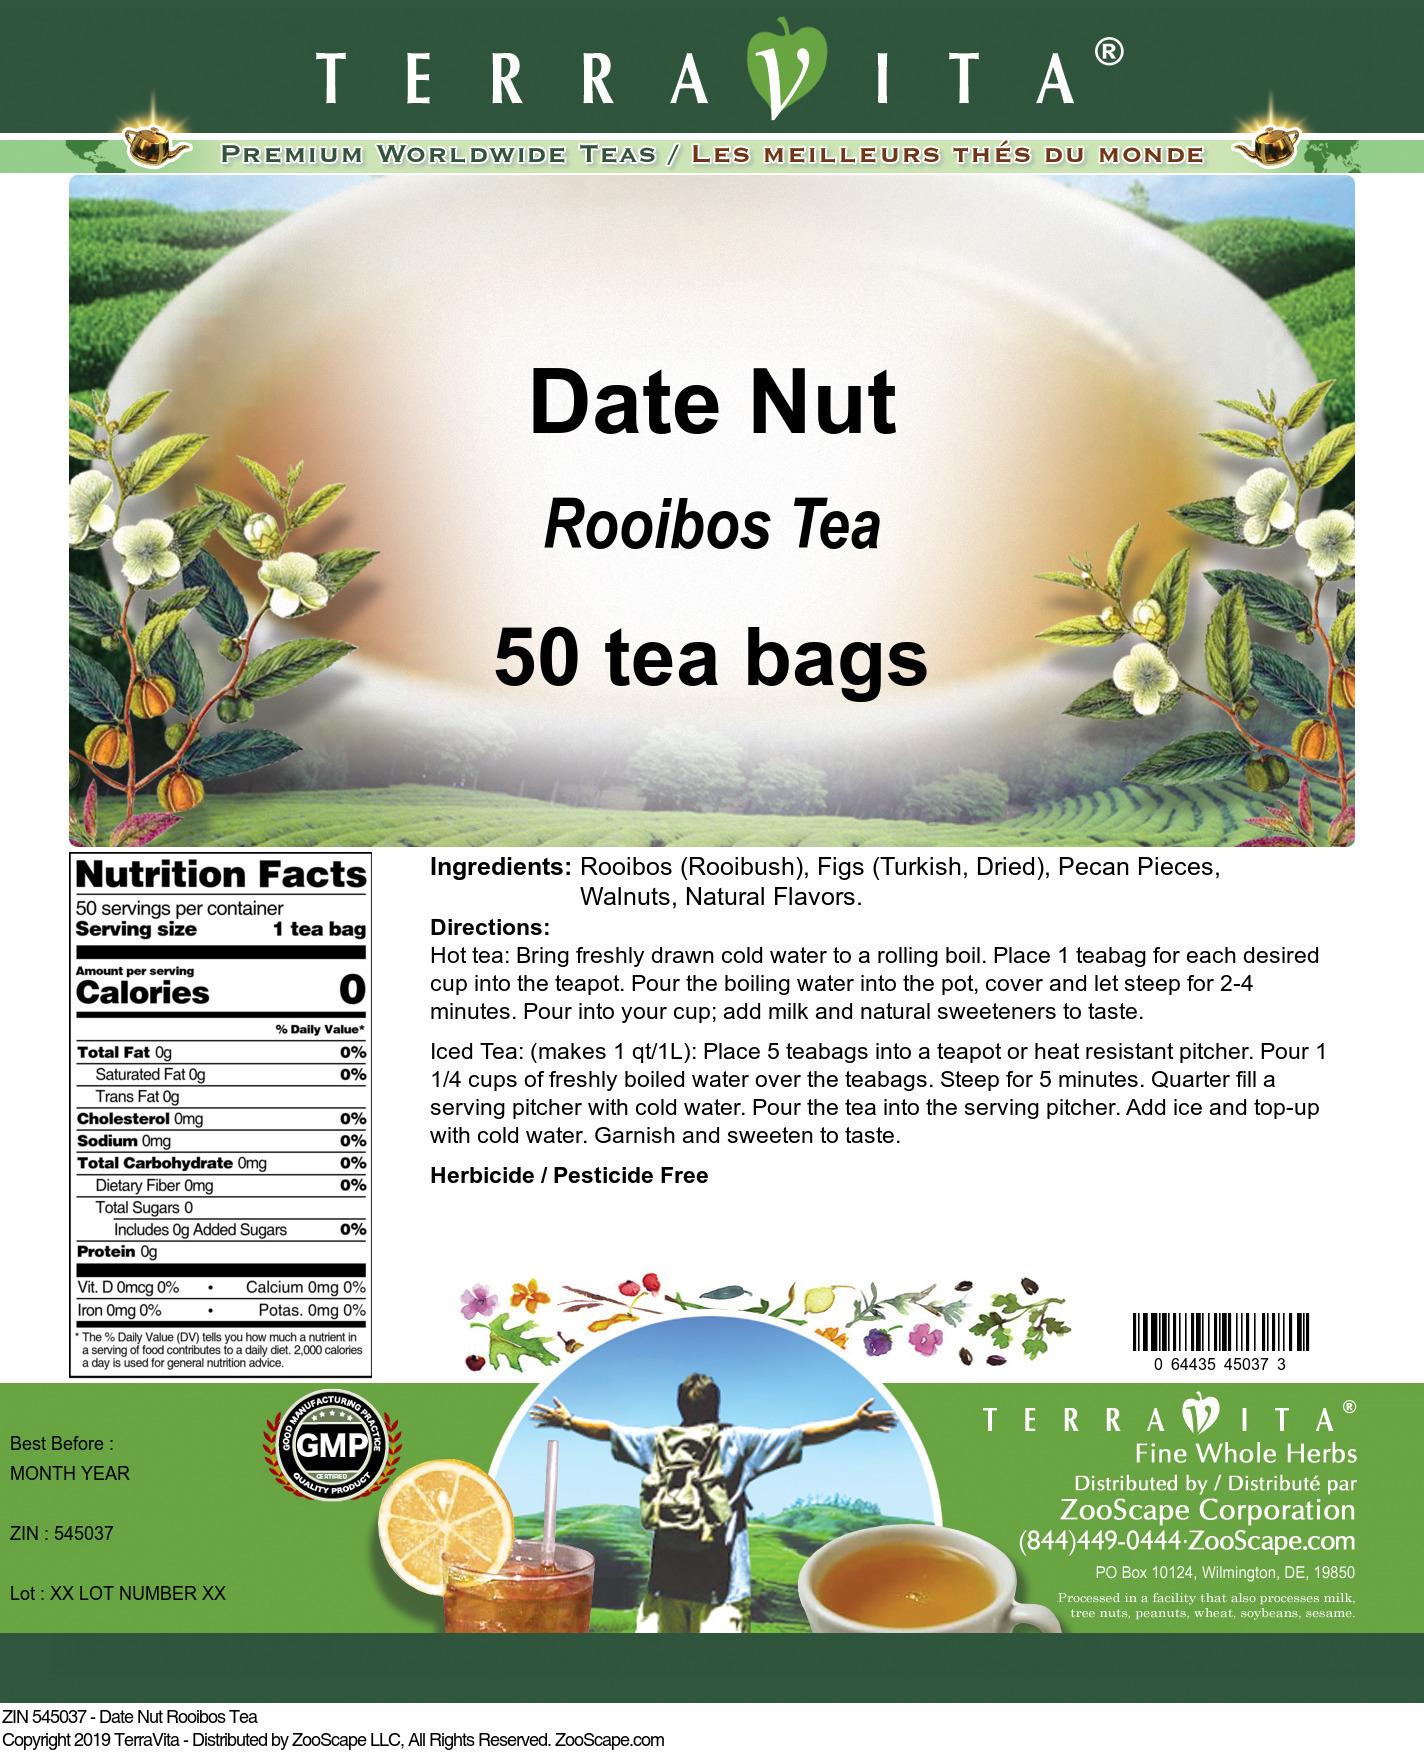 Date Nut Rooibos Tea